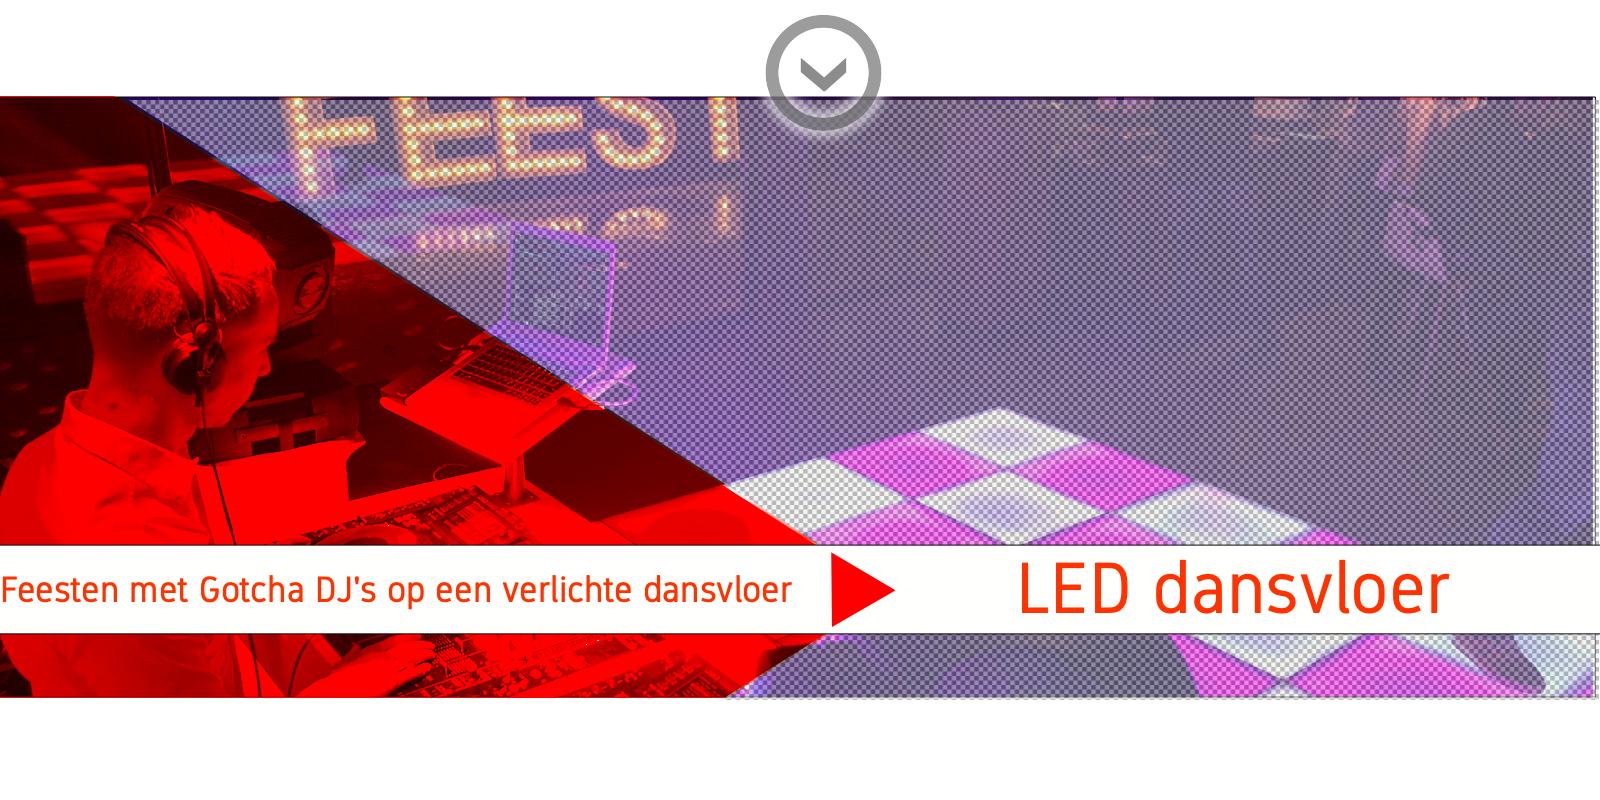 drive in show met LED dansvloer